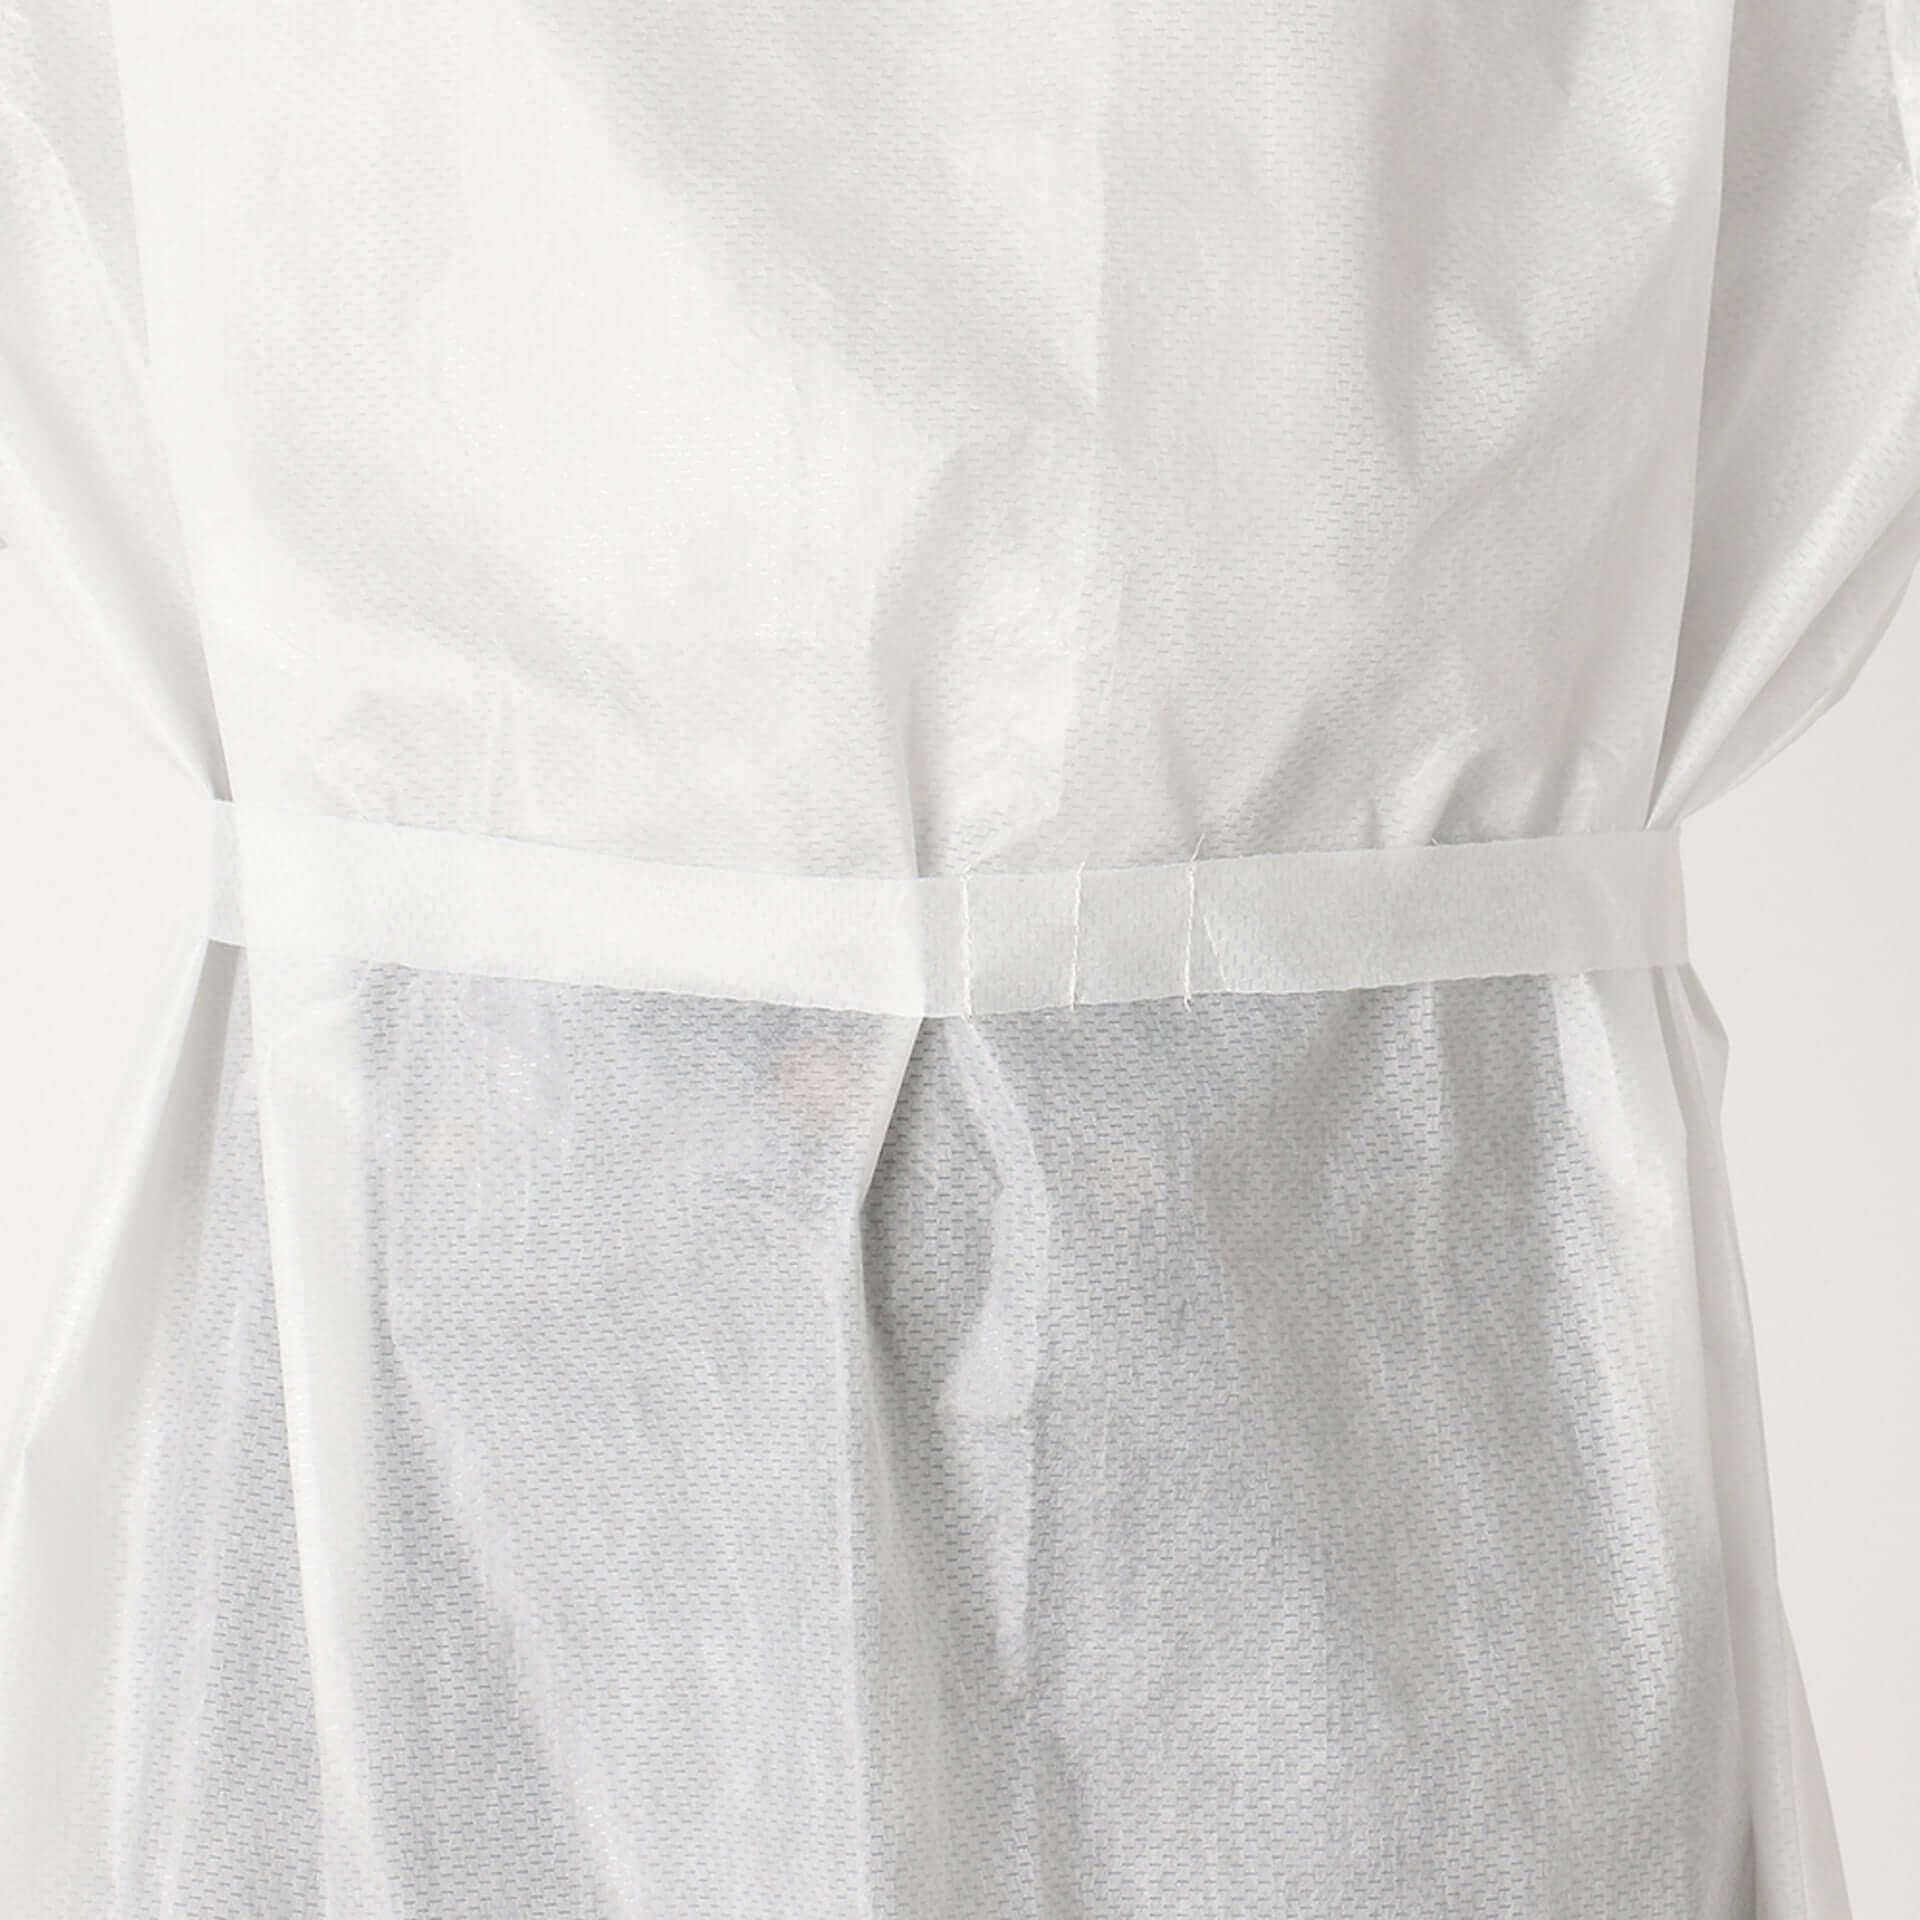 EDWINがアイソレーションガウンを自社縫製工場にて生産開始&オンライン販売もスタート! lf200722_edwin_5-1920x1920